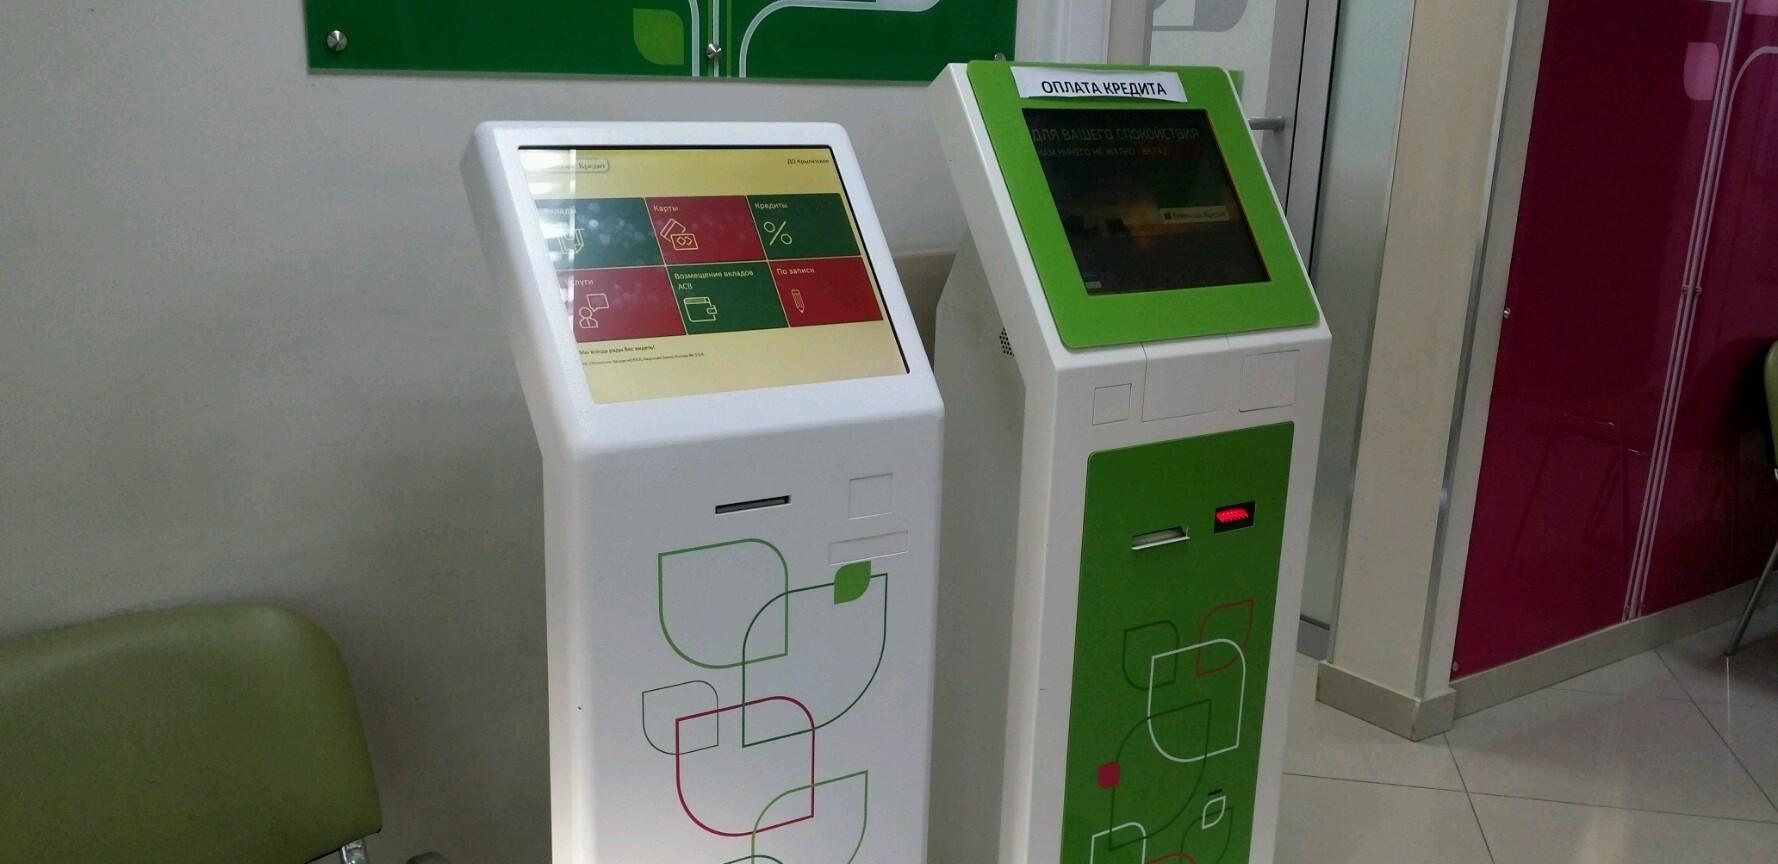 обналичивание через банкомат Ренессанс